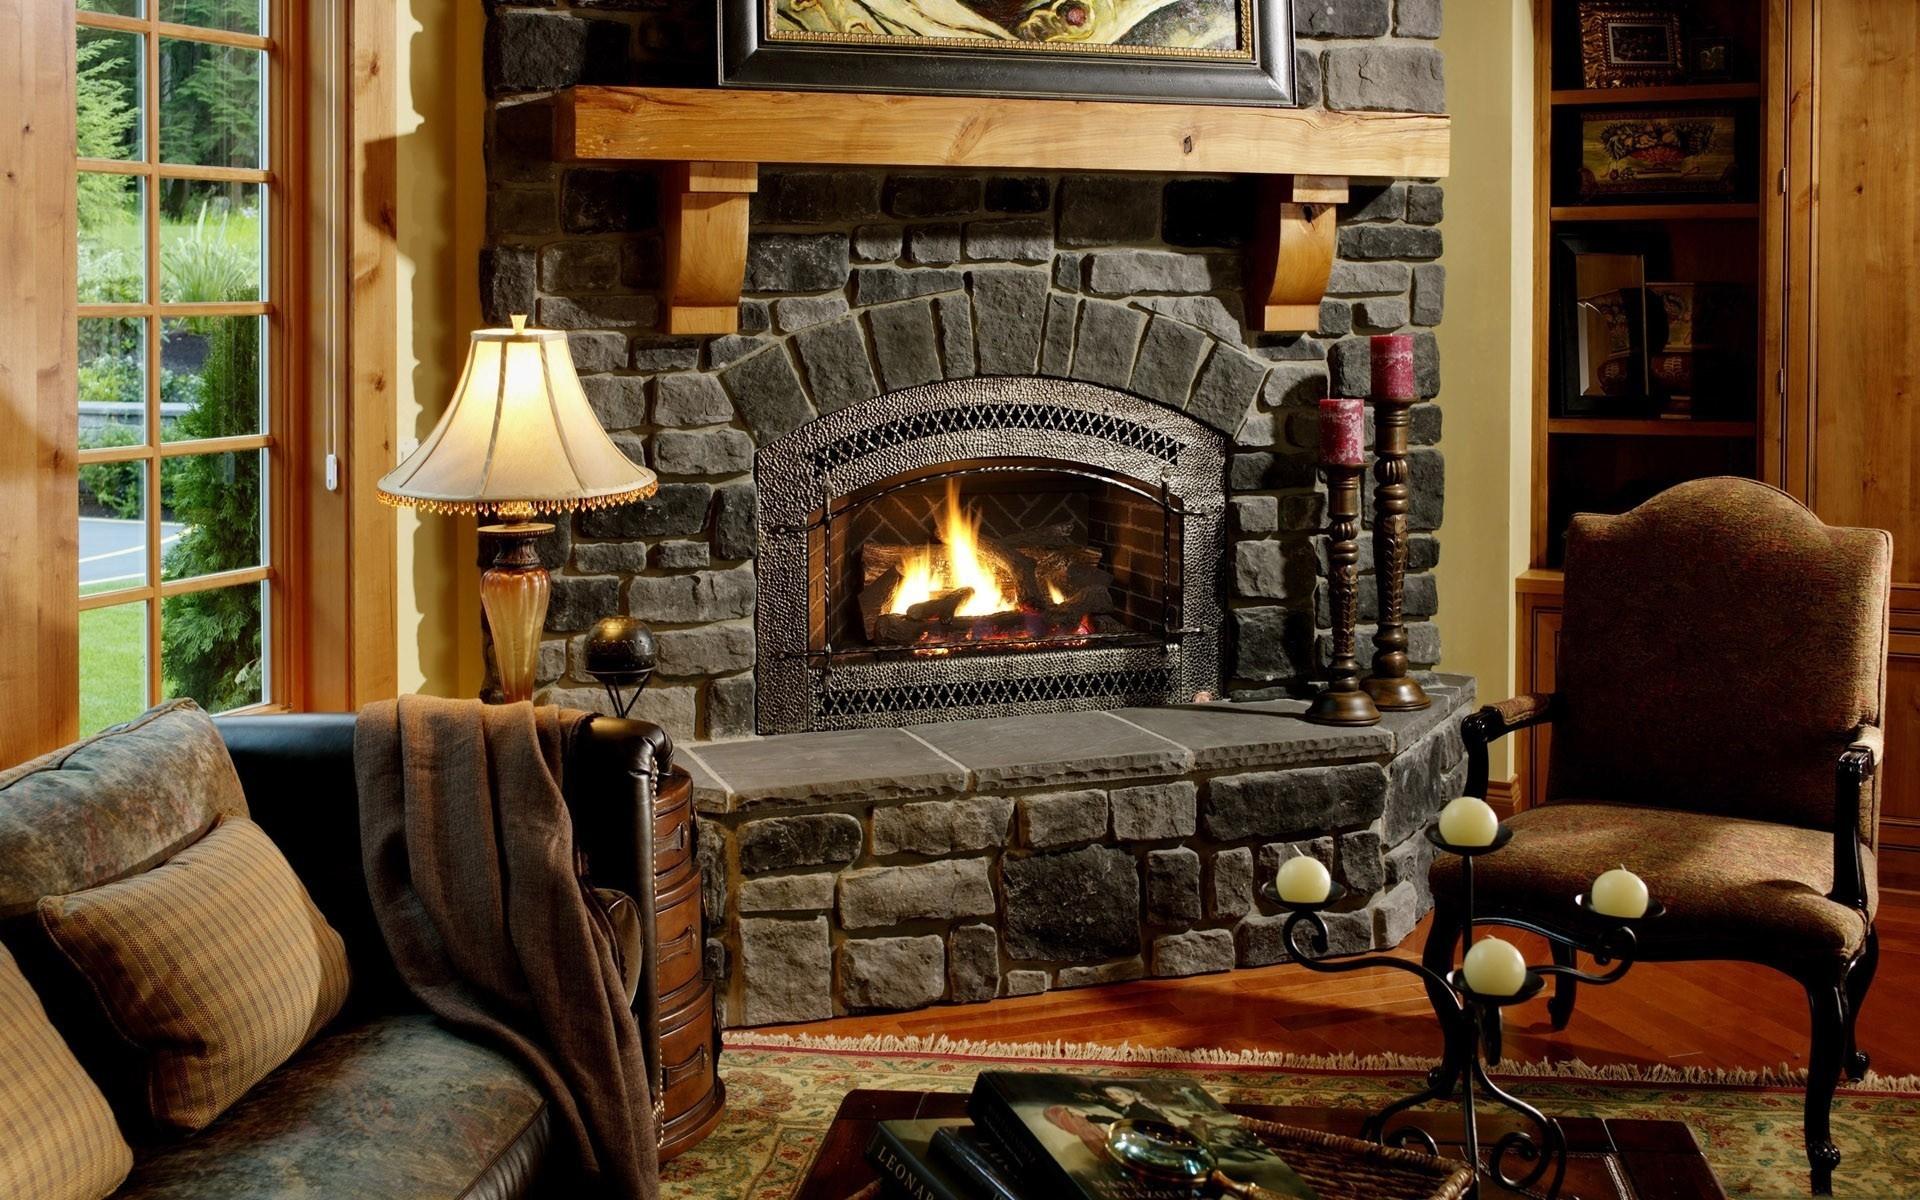 Chair Fireplace Interior Design